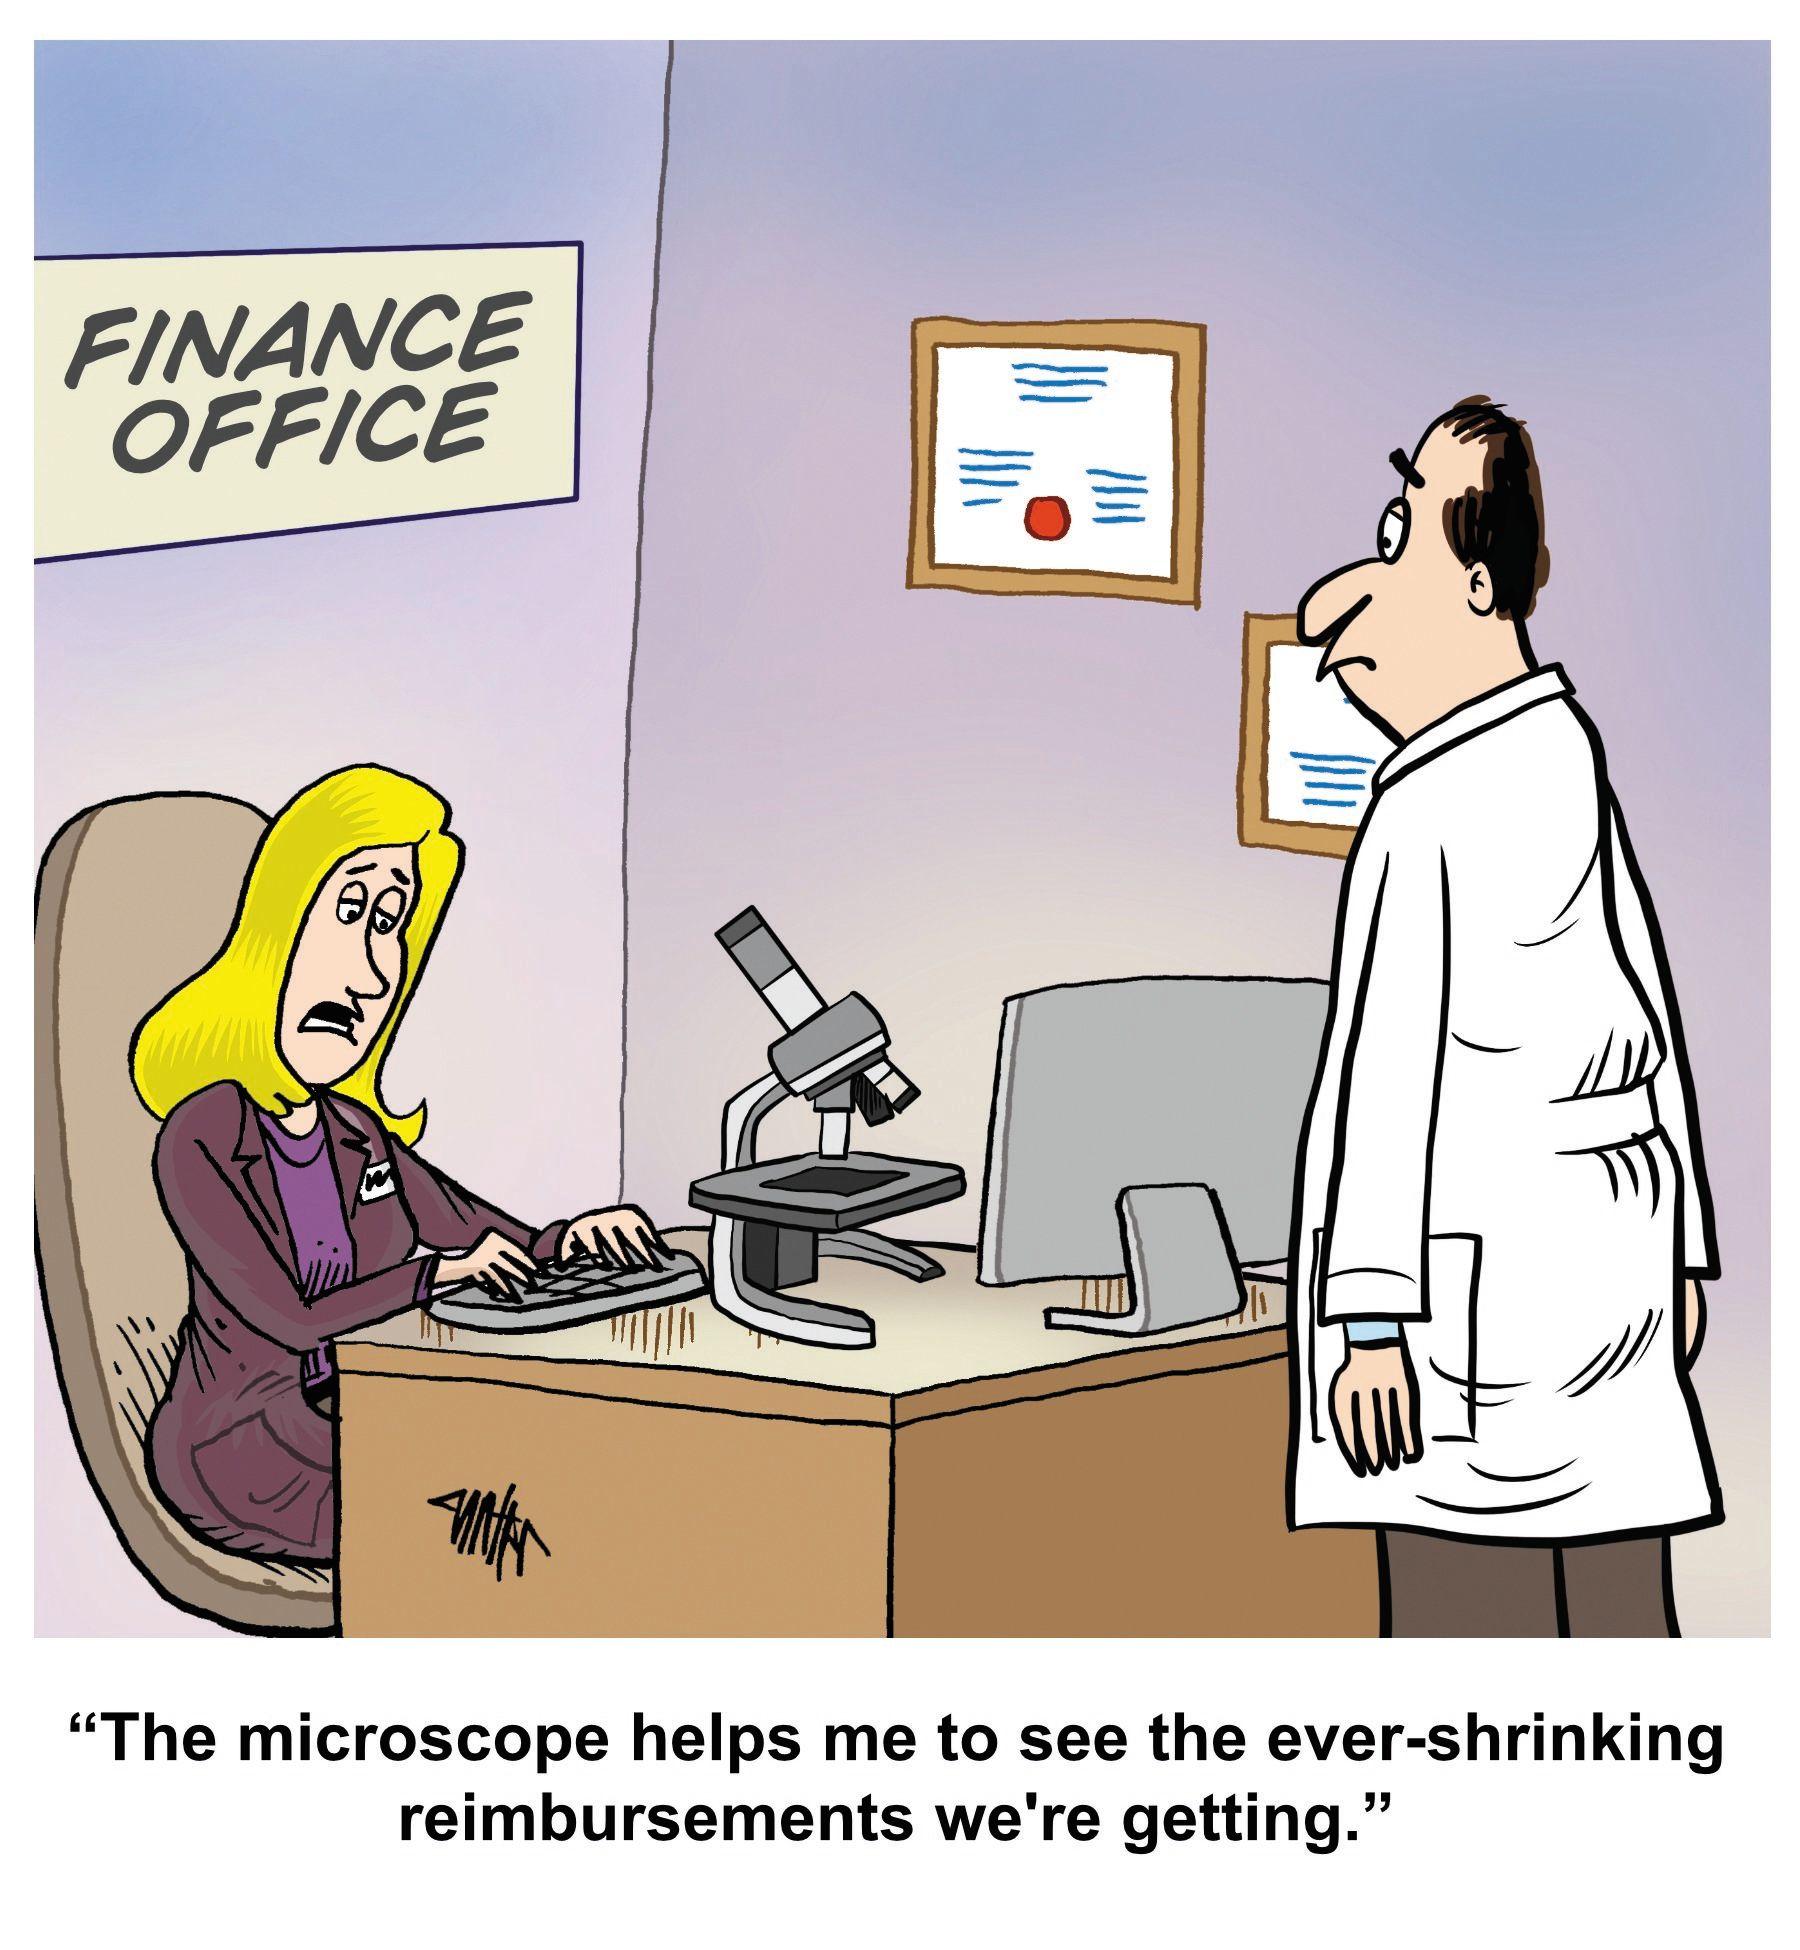 Medical Economics Cartoon: When reimbursements shrink